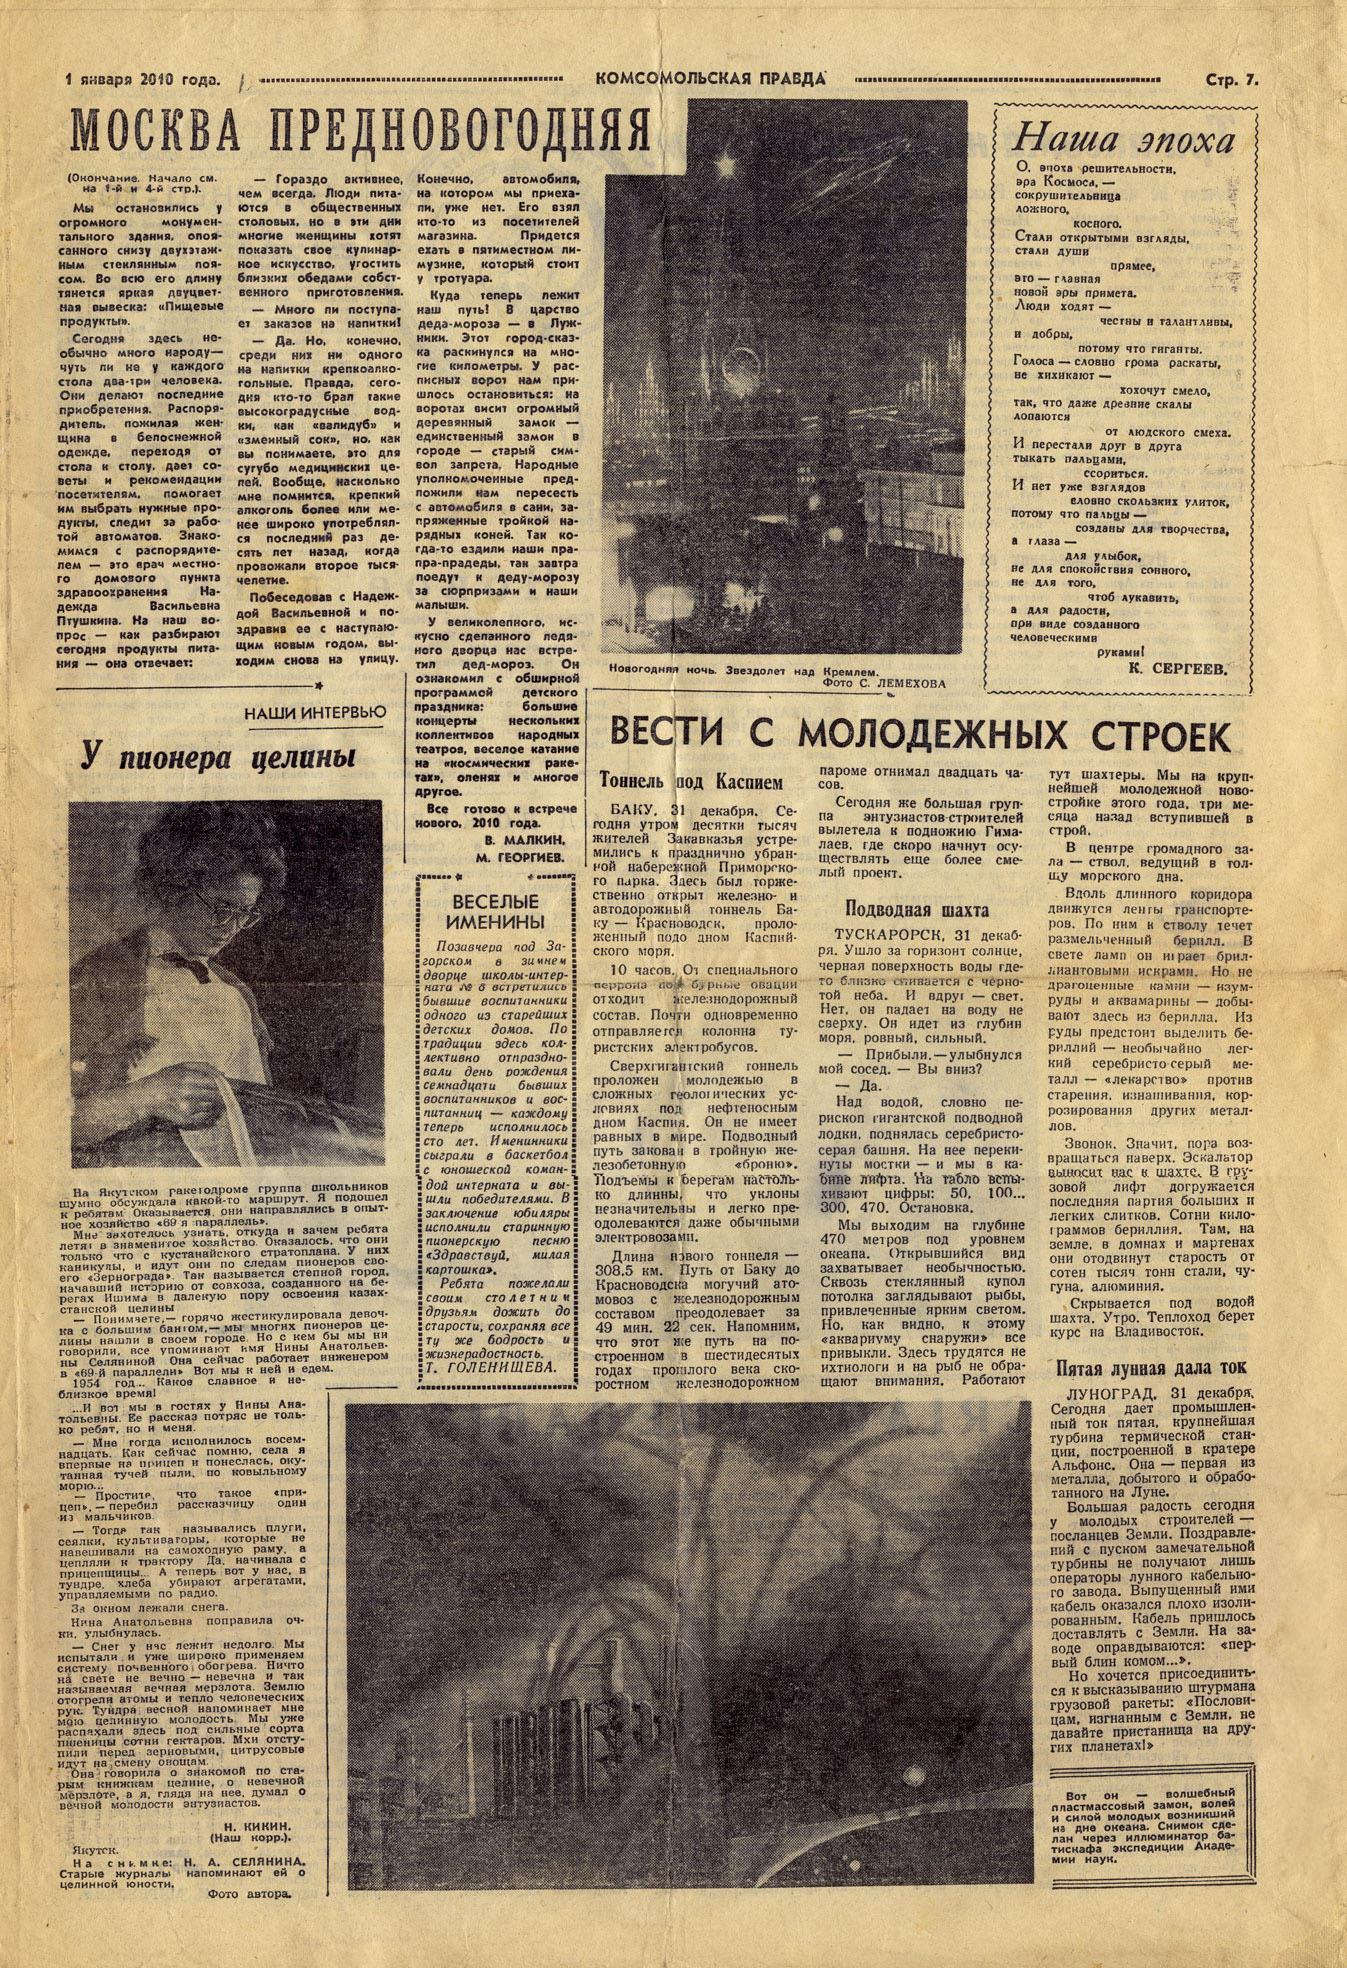 Komsomolskaja Prava Russische krant Sovjetunie